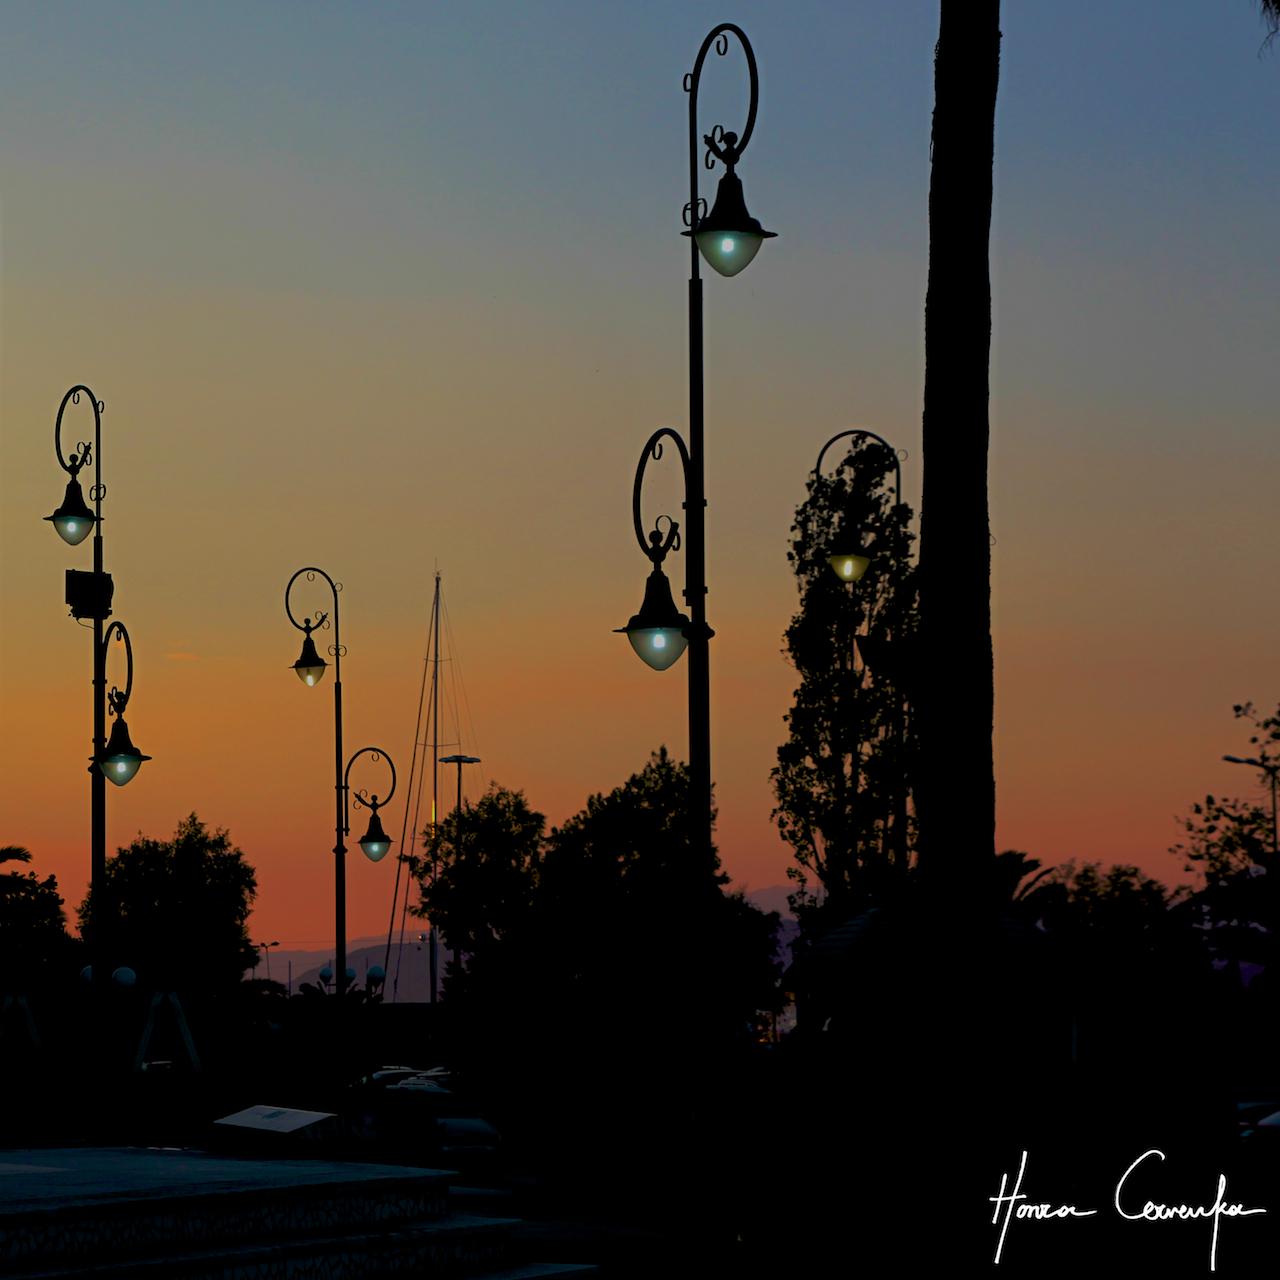 Corinth - nothing like a sunset